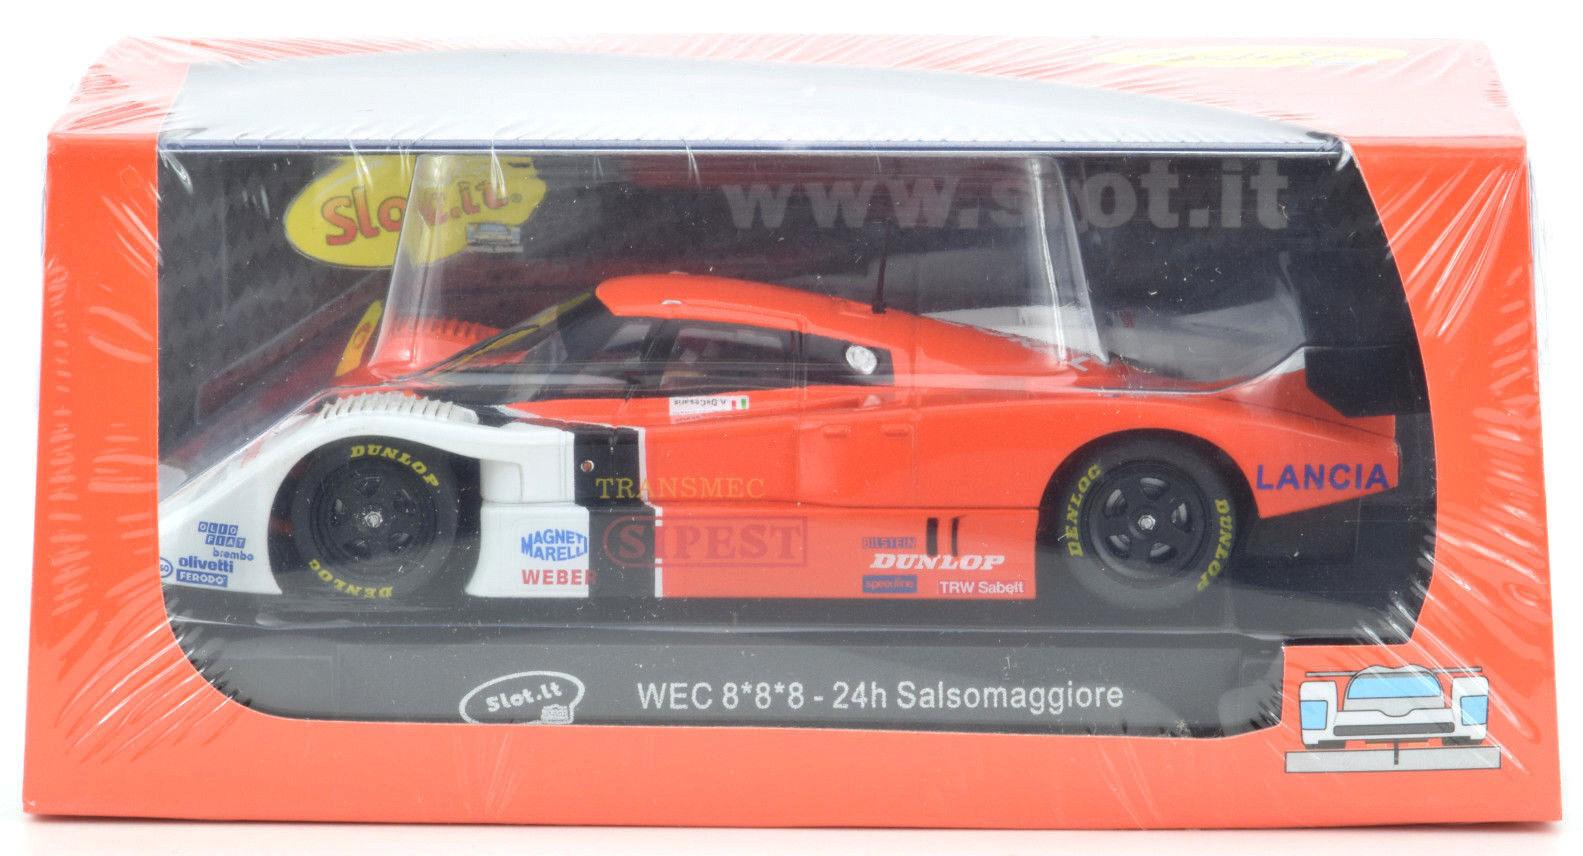 Slot It Zoll Sipest Lancia Lc2 - Wec 24hr Salsomaggiore 1 32 Maßstab Slotcar